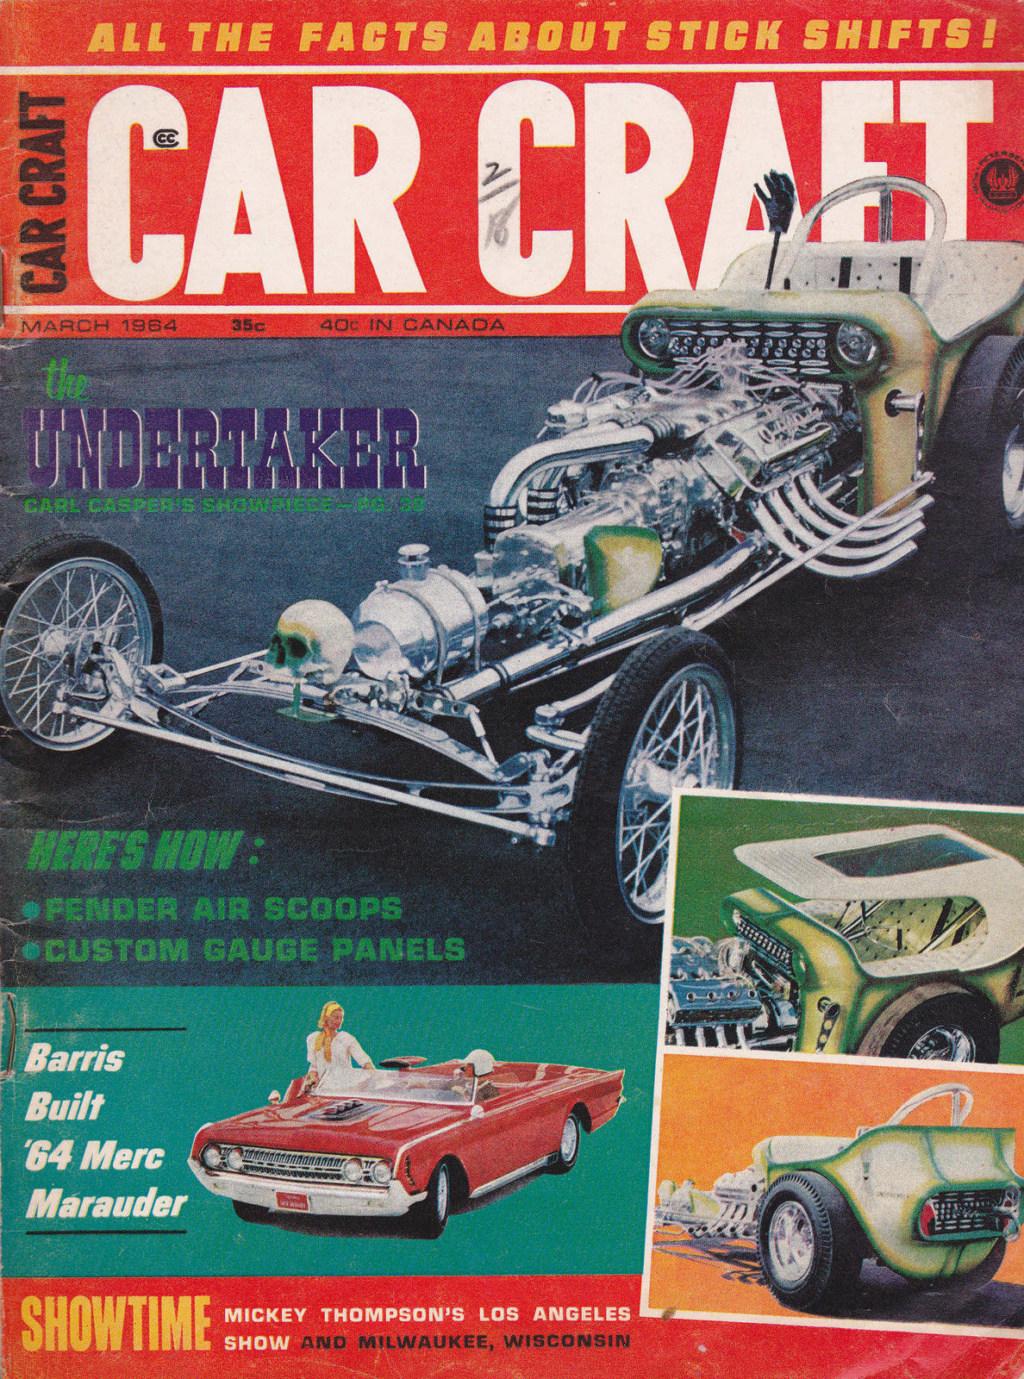 1964 Mercury Super Marauder  - George Barris Carcra12